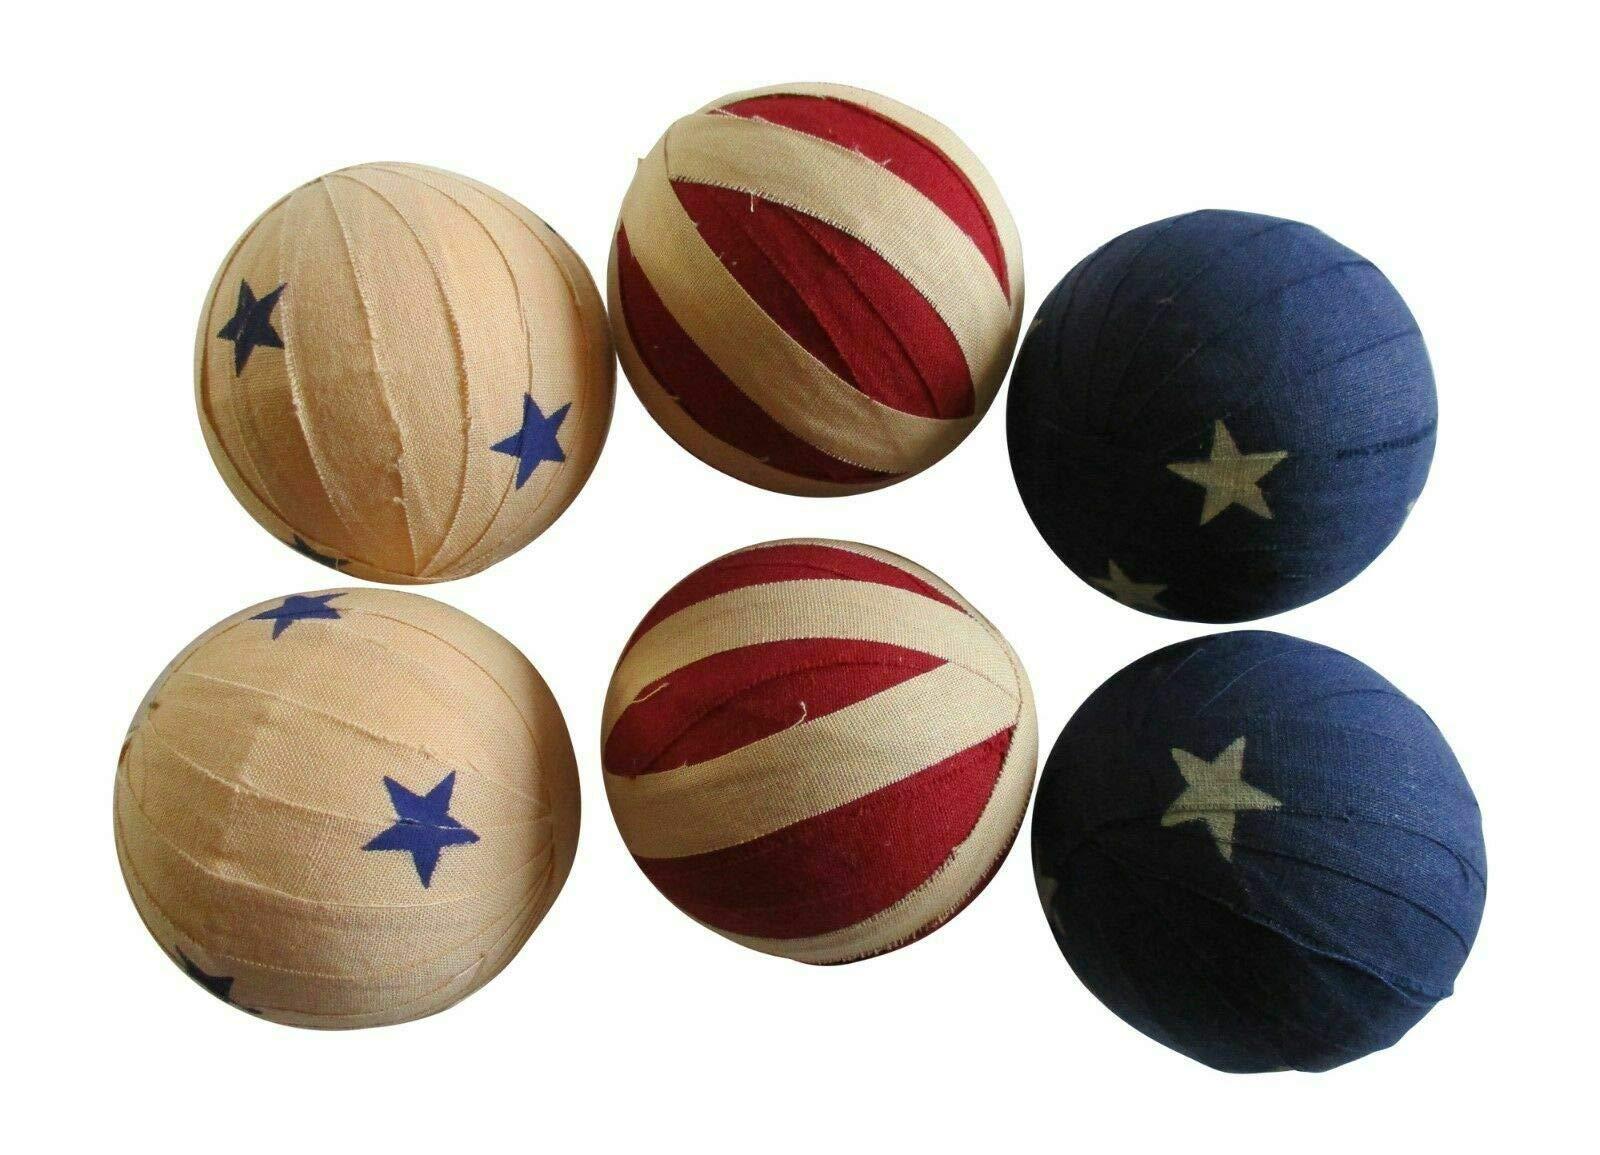 Primitive & Country Style 6 Primitive Americana Rag Balls - 2.5'' Bowl Fillers - Patriotic Rustic Home Decor